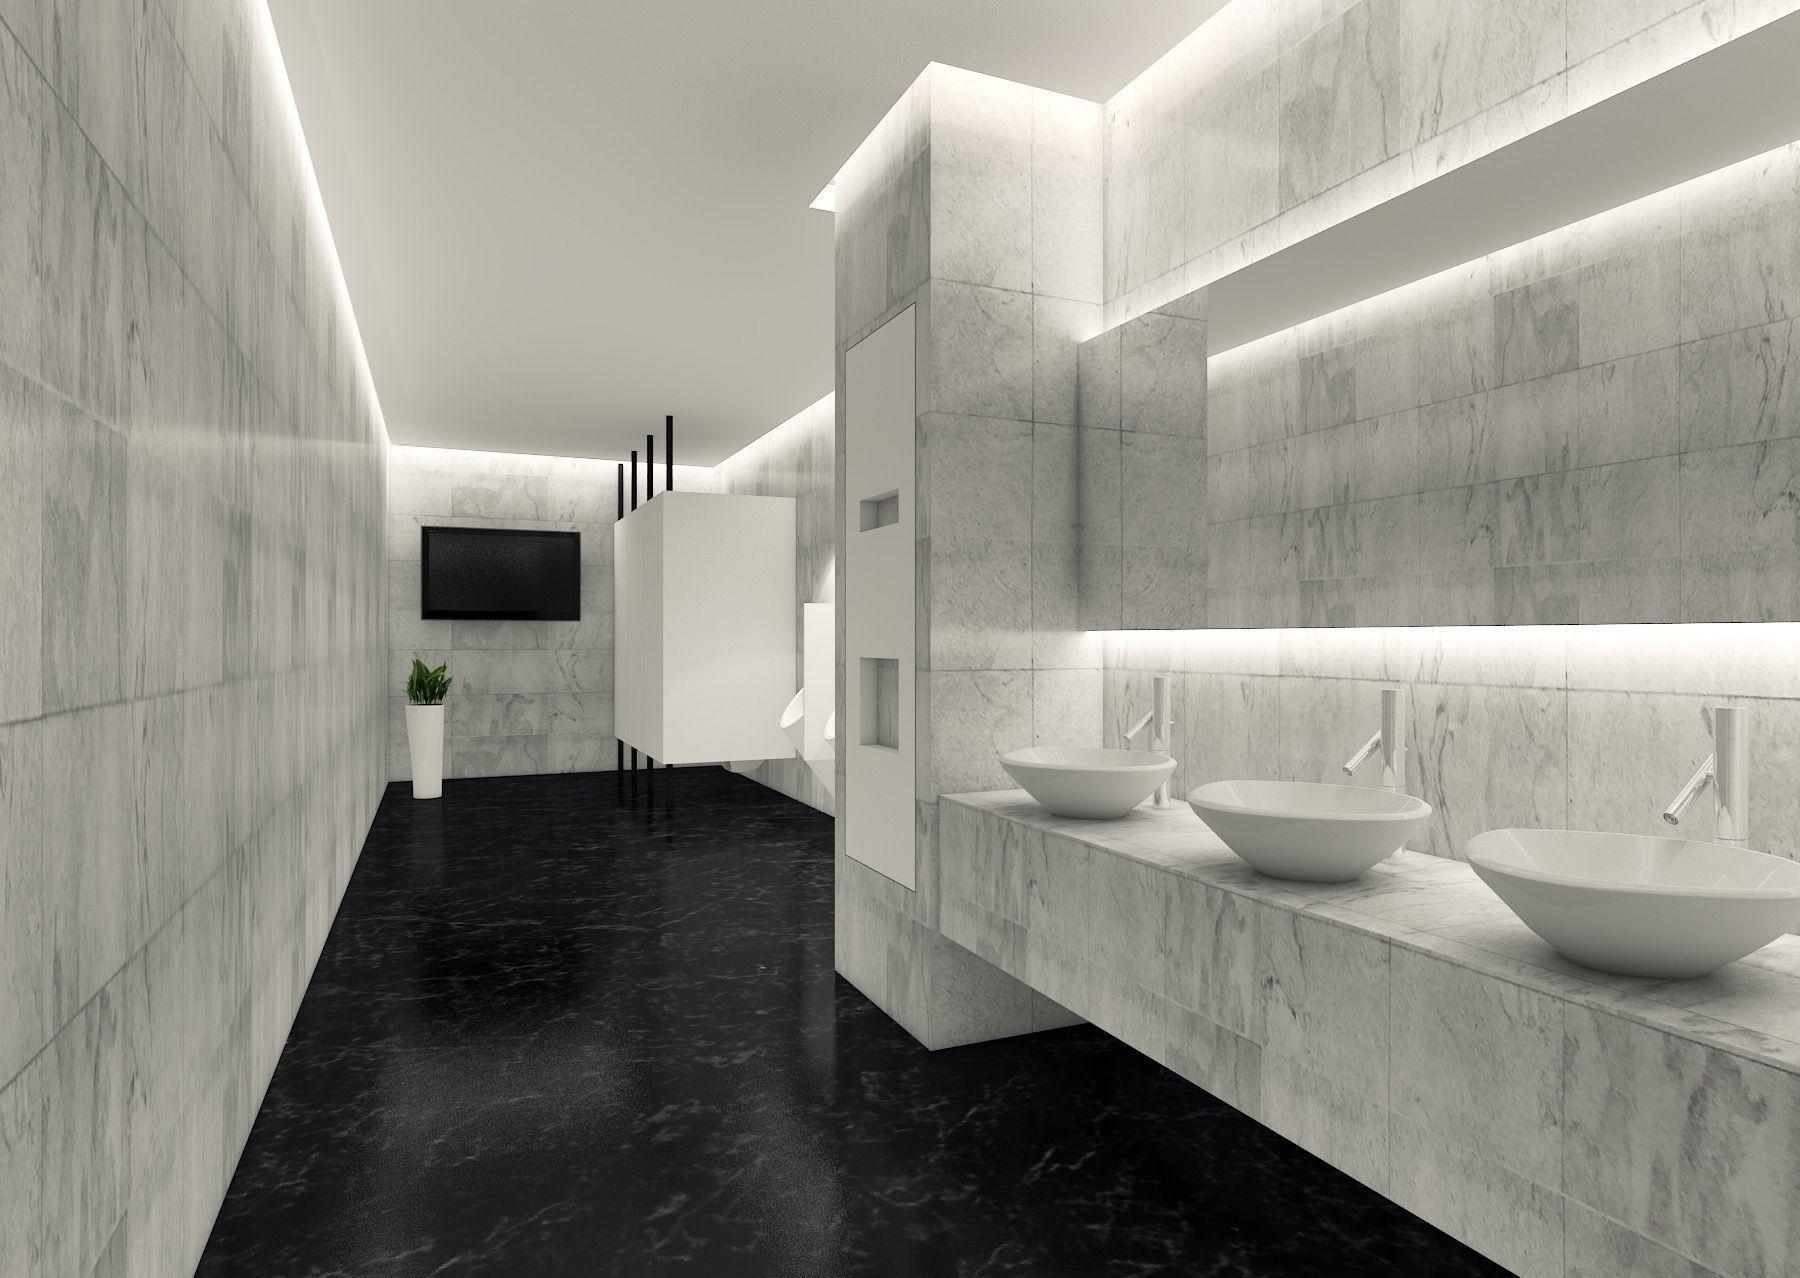 Don T Wait To Get The Best Luxury Bathroom Lighting Design Restroom Design Luxury Bathroom Best Bathroom Lighting